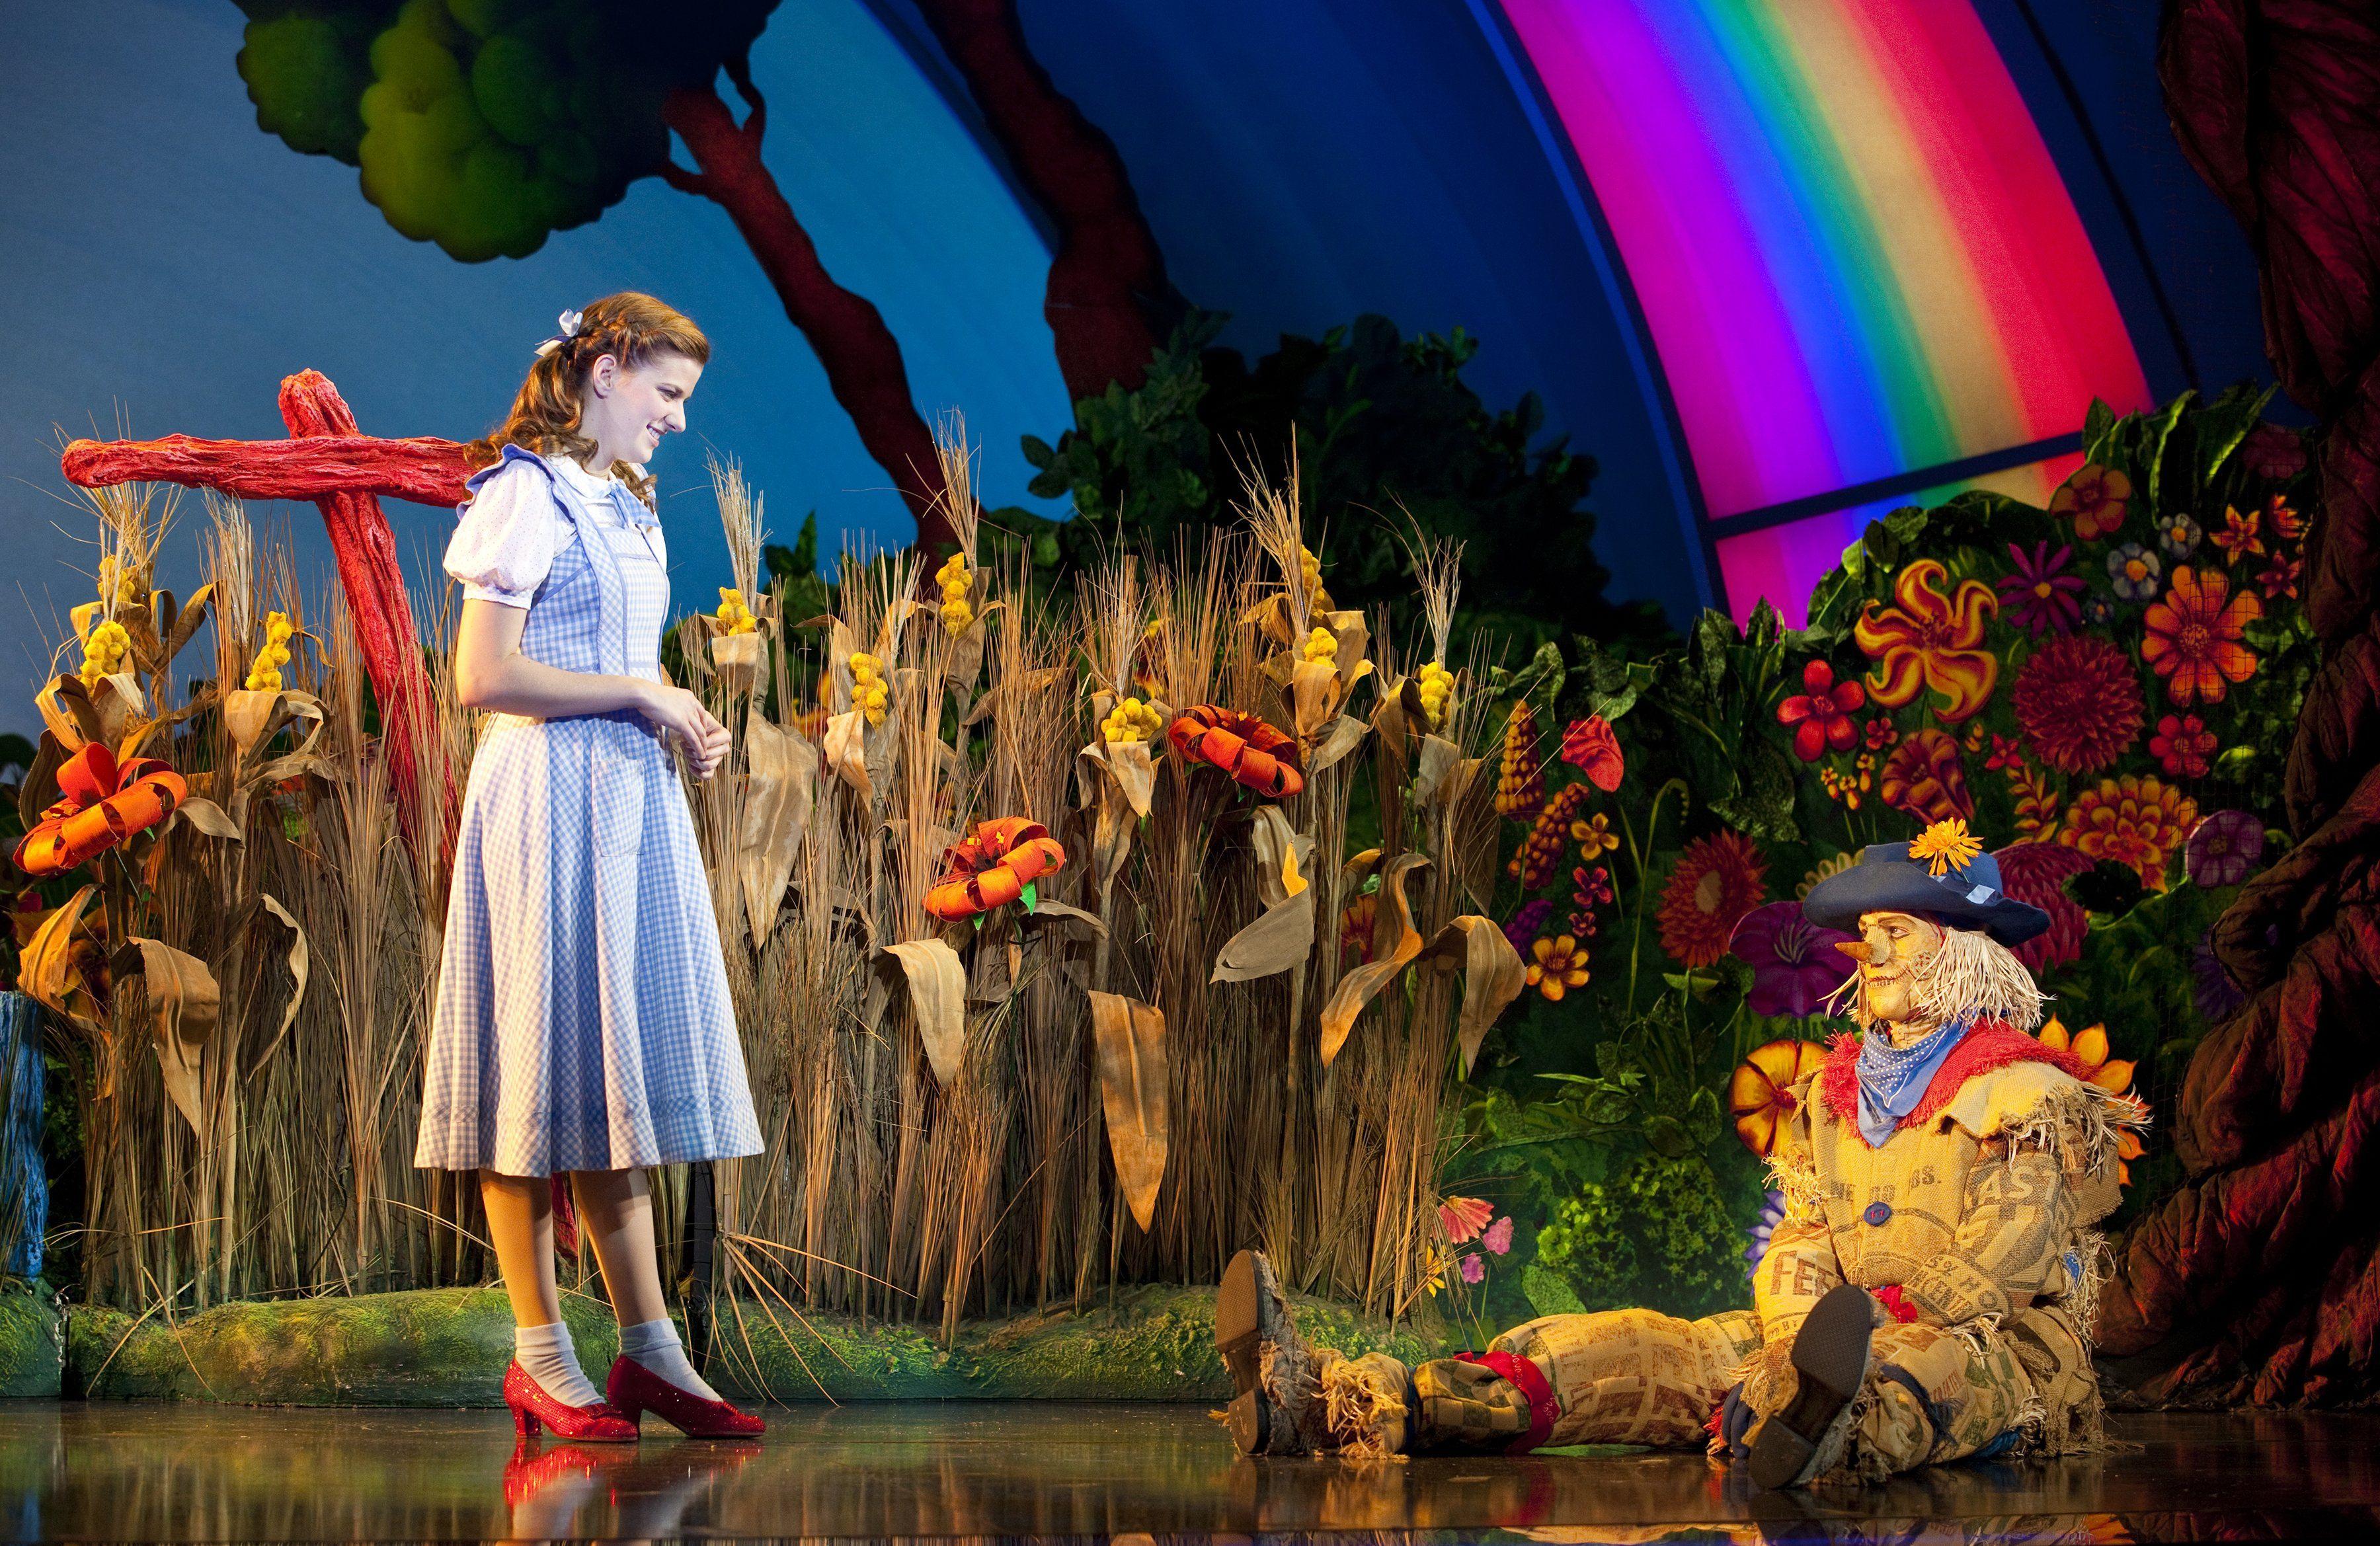 Wizard Of Oz Wallpapers Wallpaper Hd Pinterest